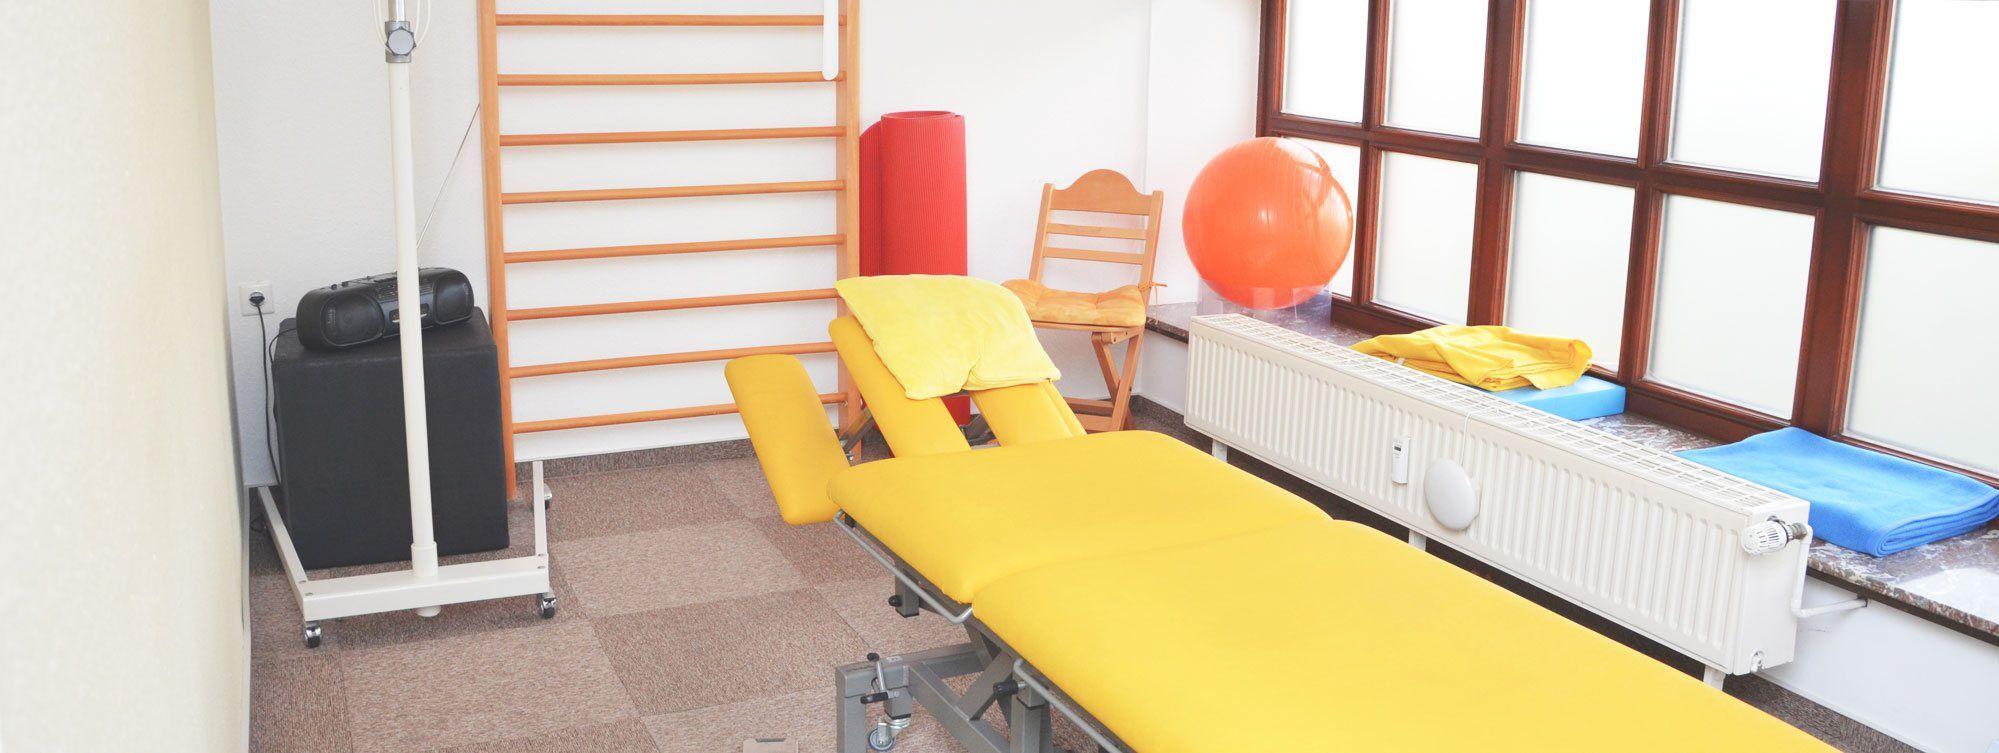 Unser Behandlungsraum